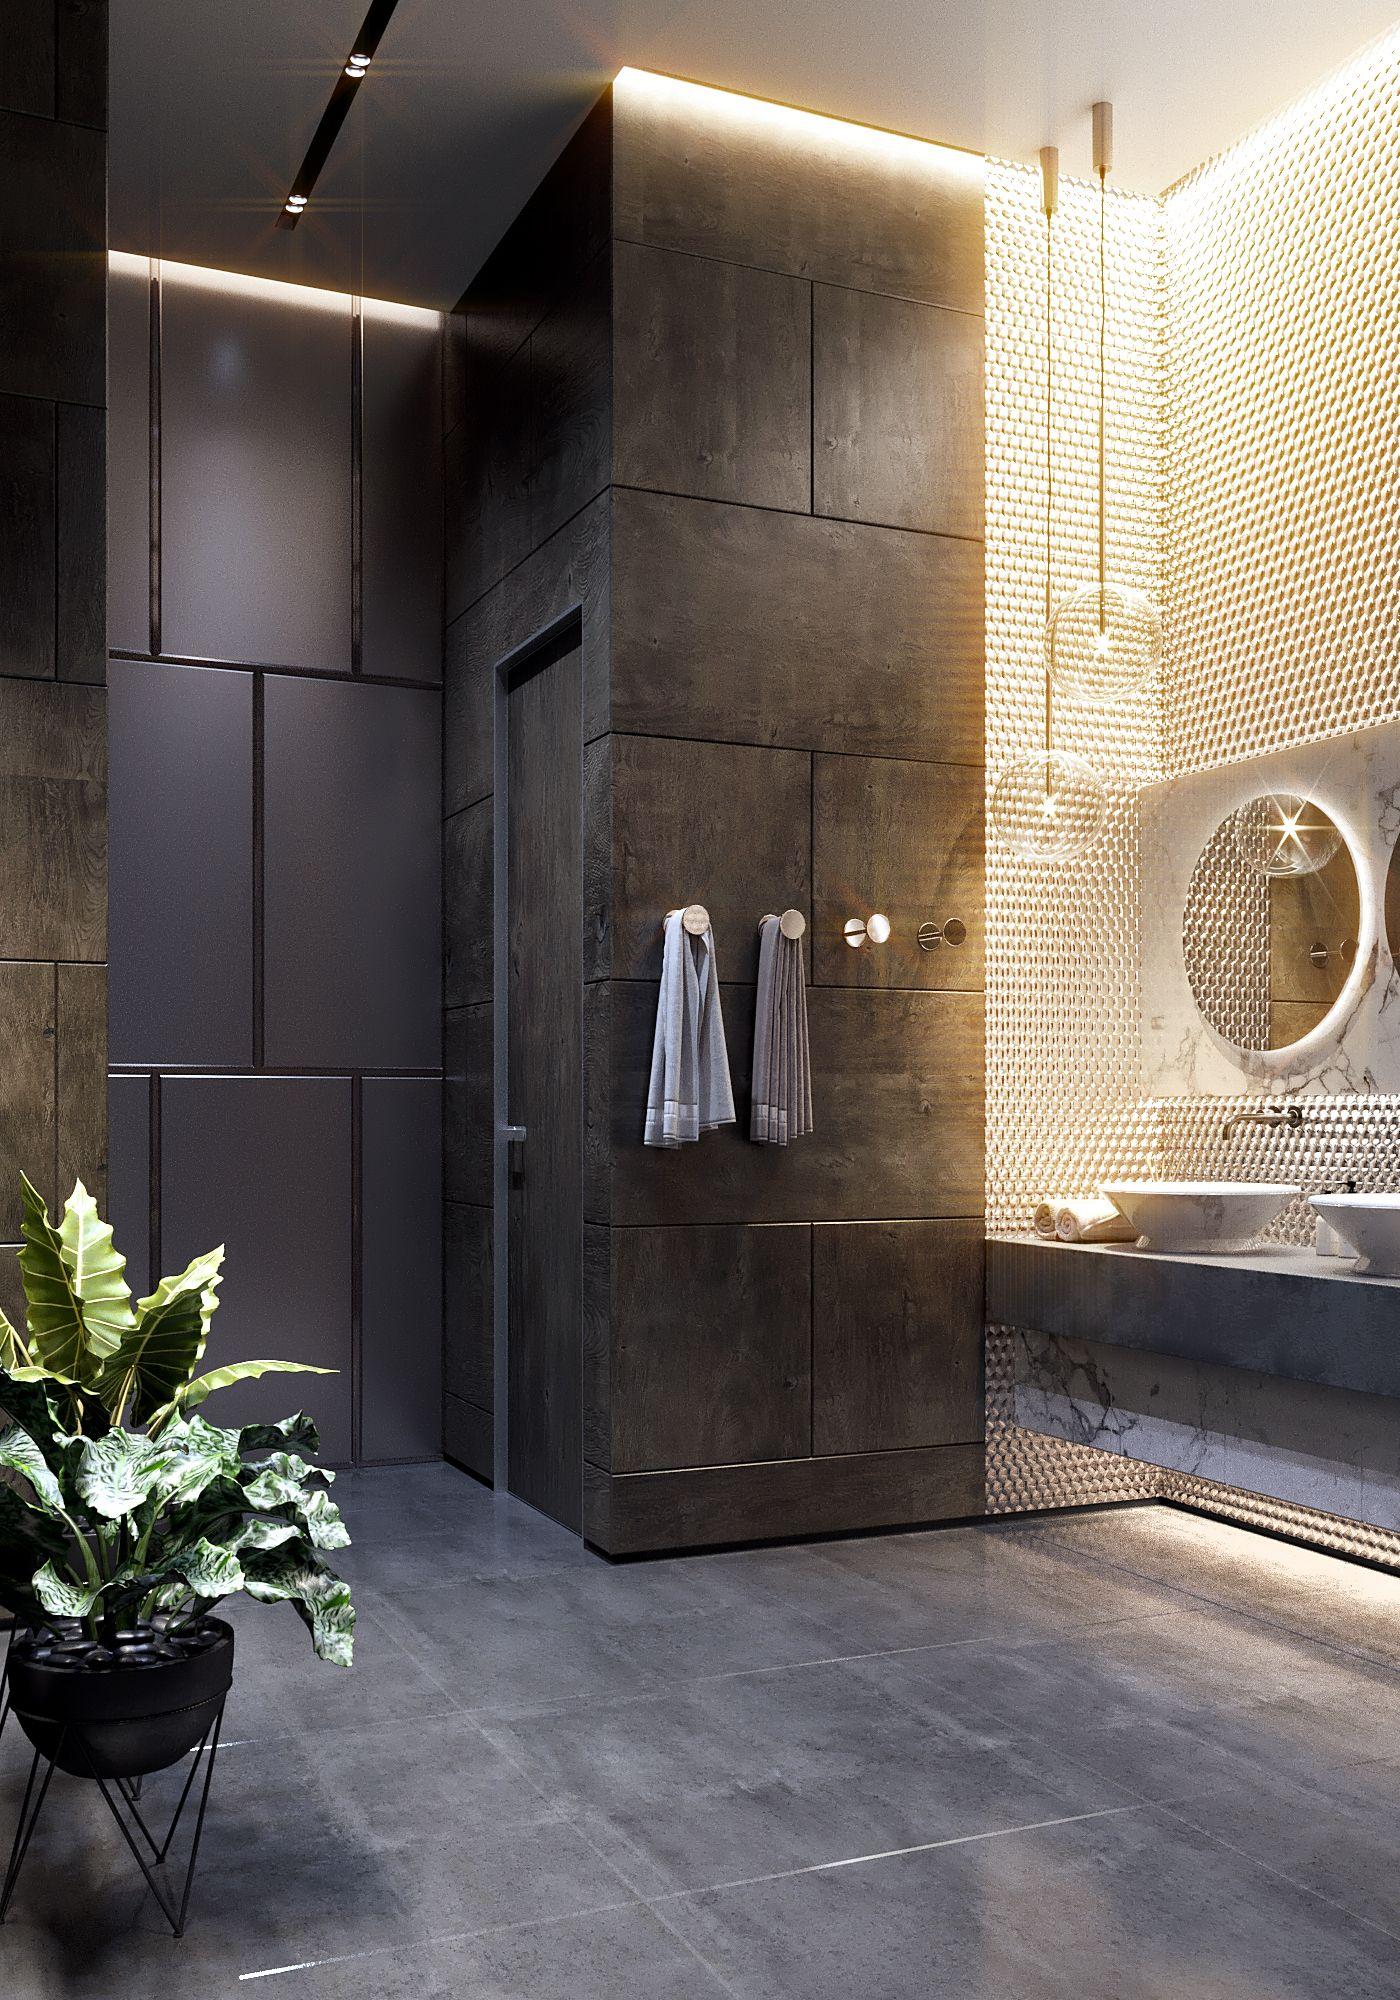 Pin By Tyrent Rex On Bathrooms Bathroom Design Luxury Bathroom Interior Design Modern Bathrooms Interior Modern bathroom interior decorating